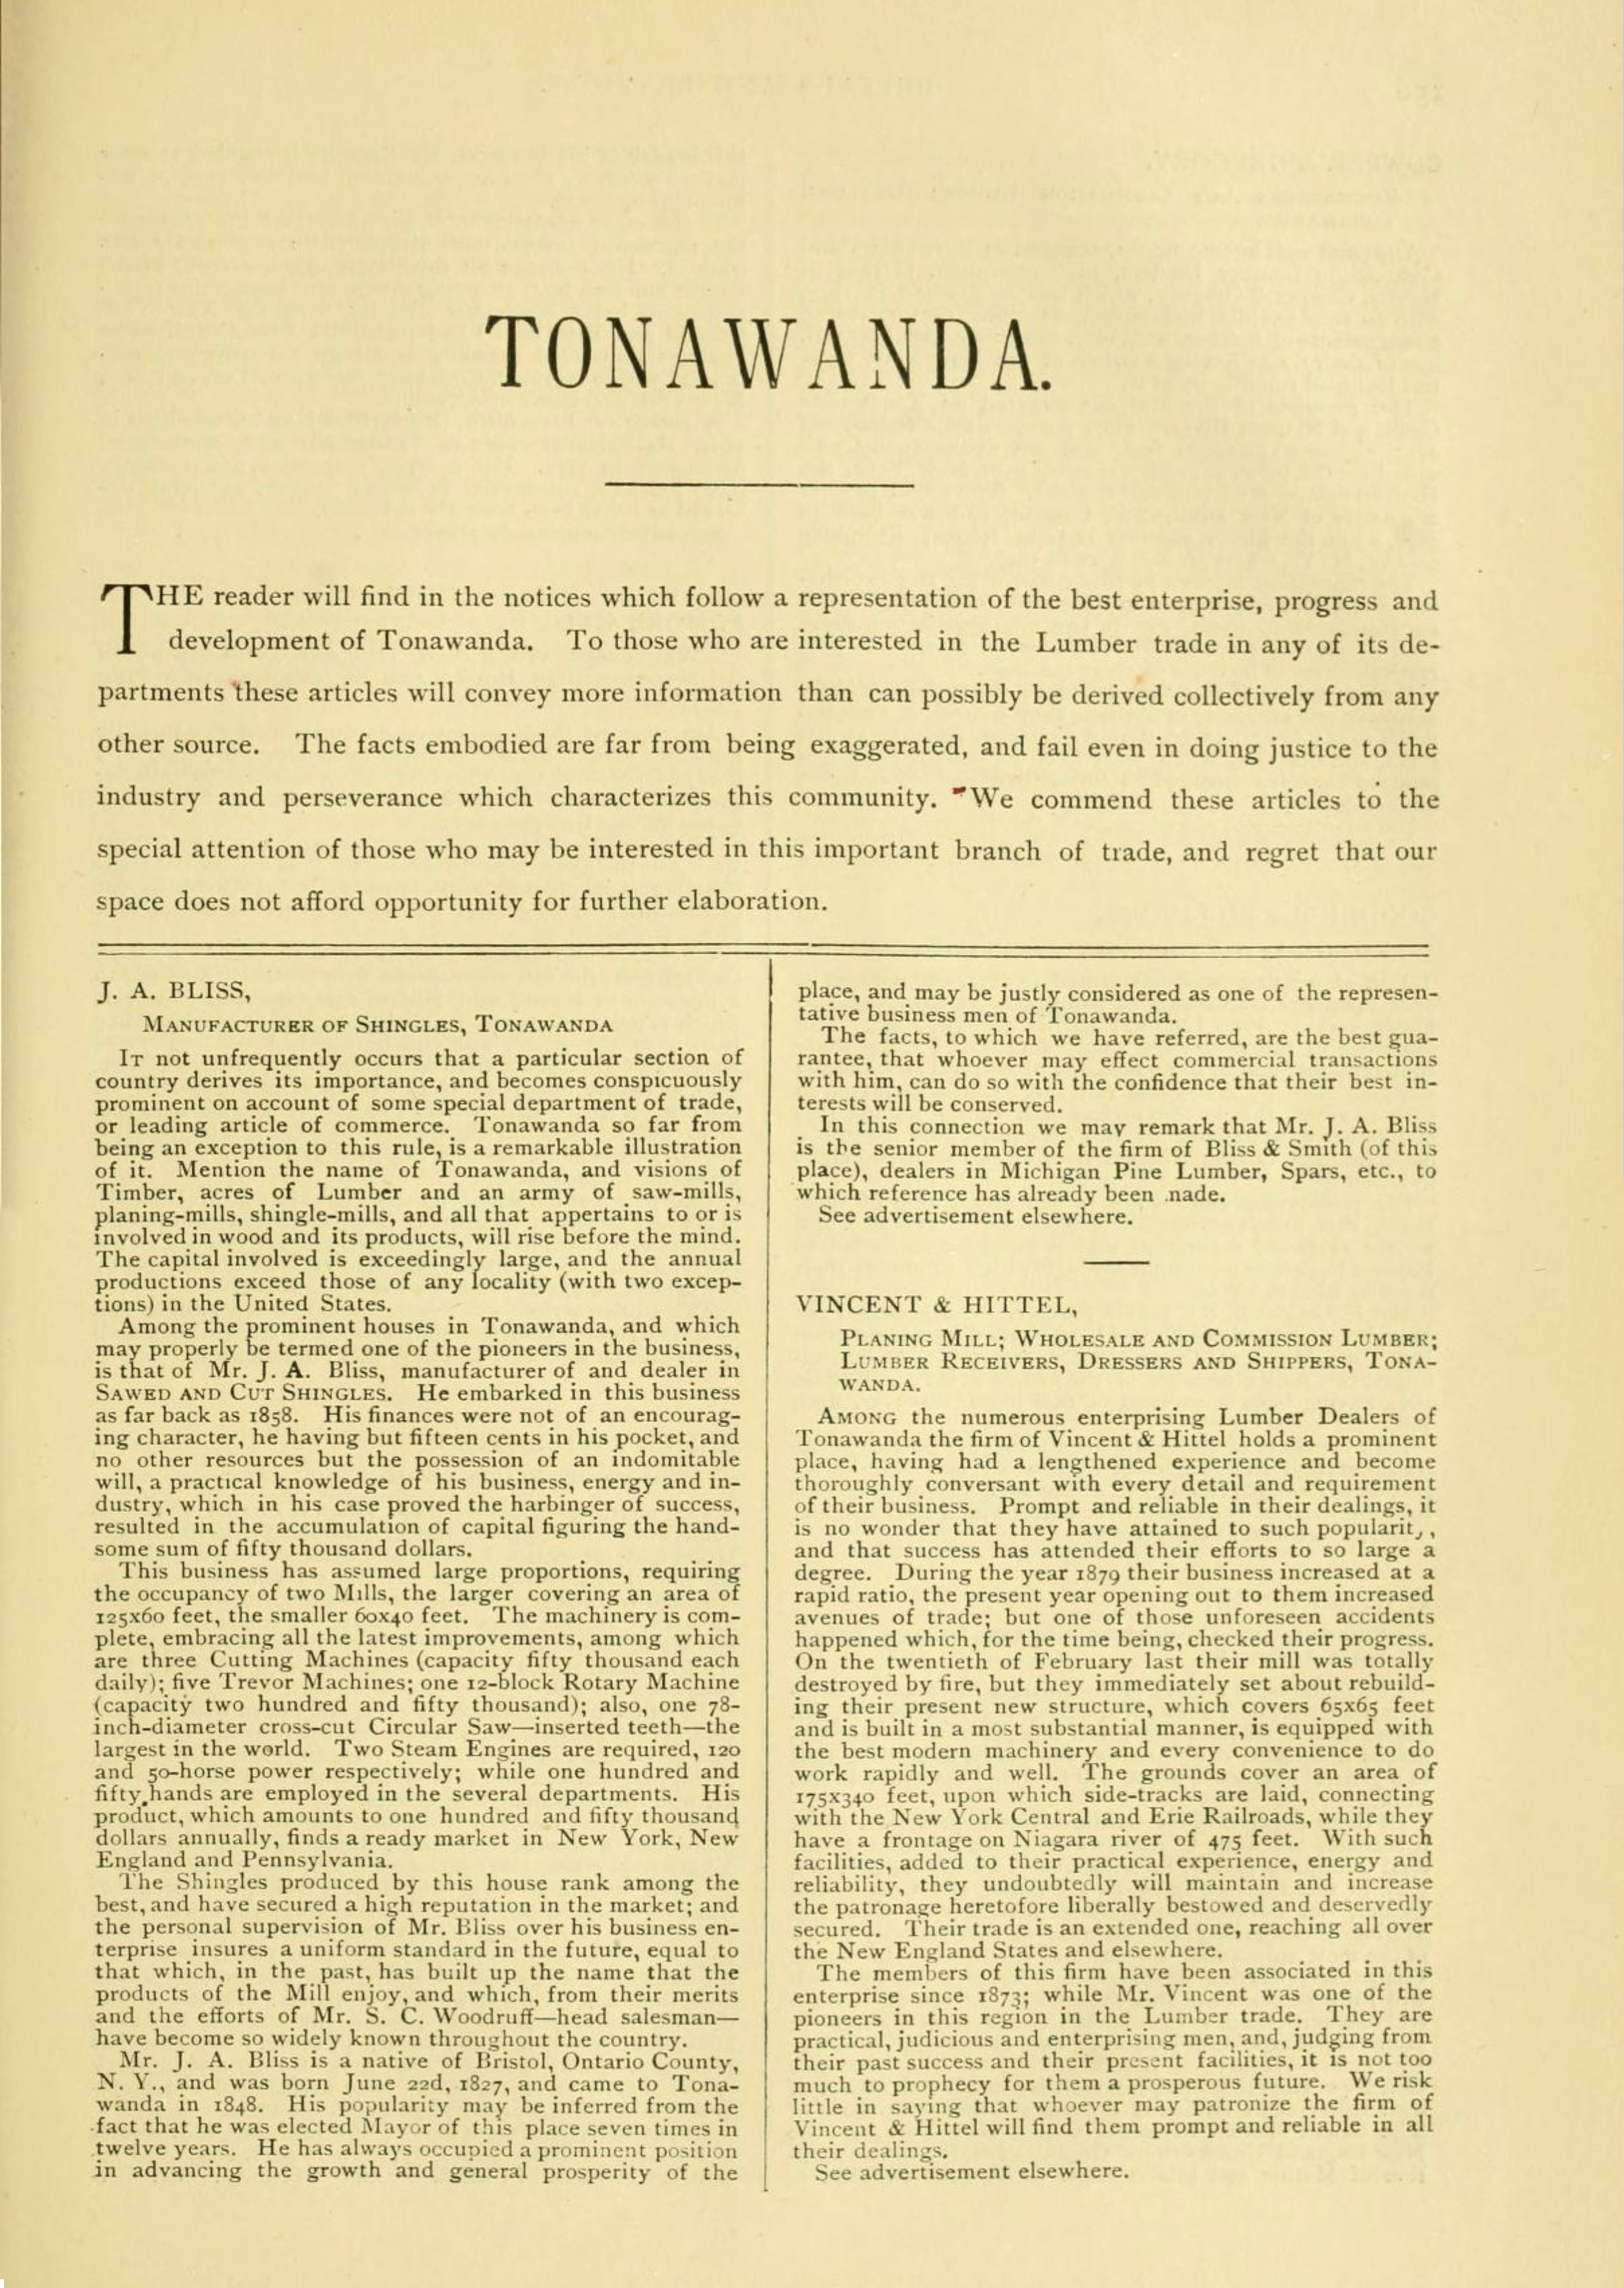 Tonawanda, book excerpt (Commerce, 1880) p155.jpg